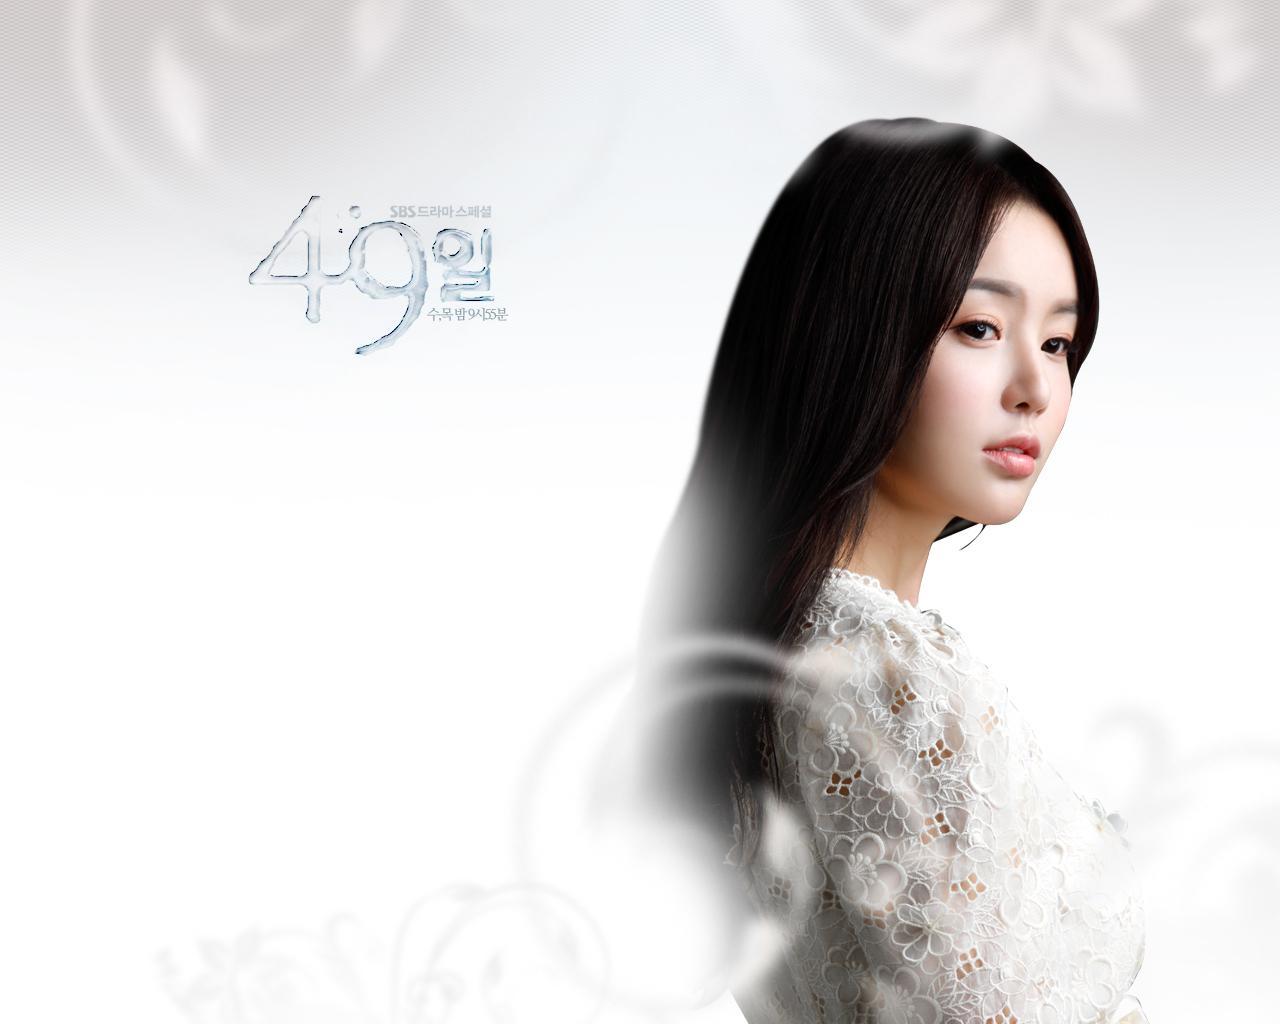 http://korean-cute.sosugary.com/albums/userpics/10001/156.jpg